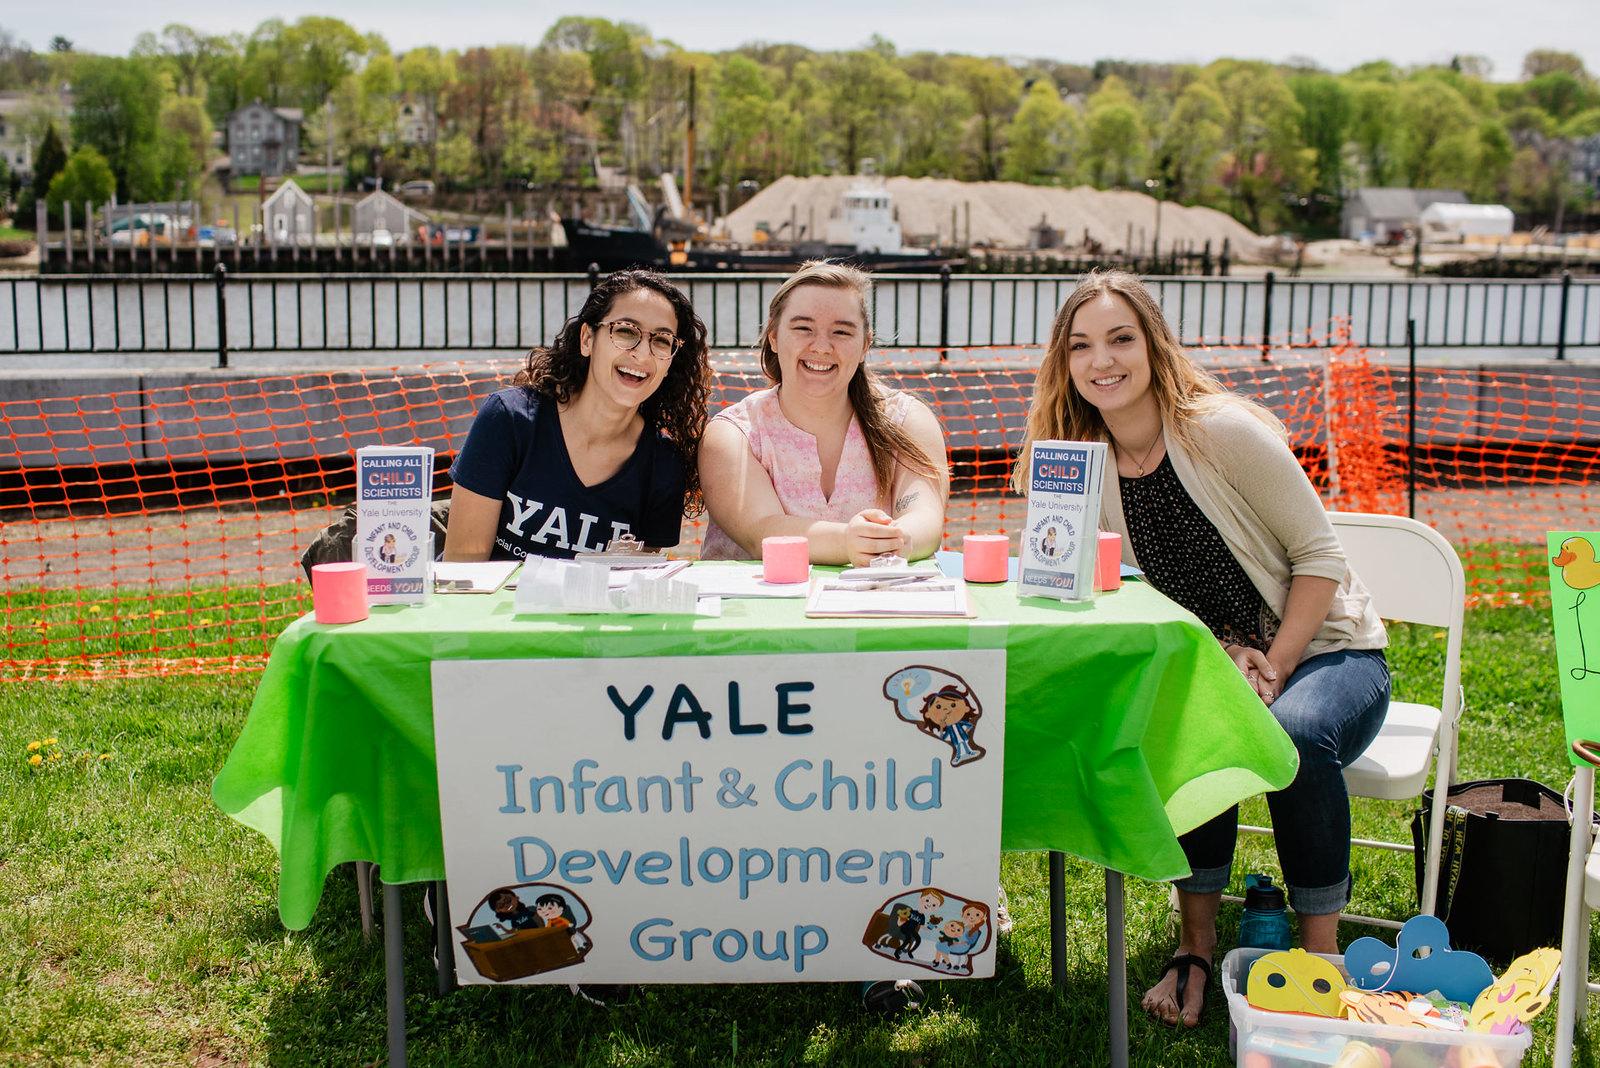 Yale Infant & Child Development Group